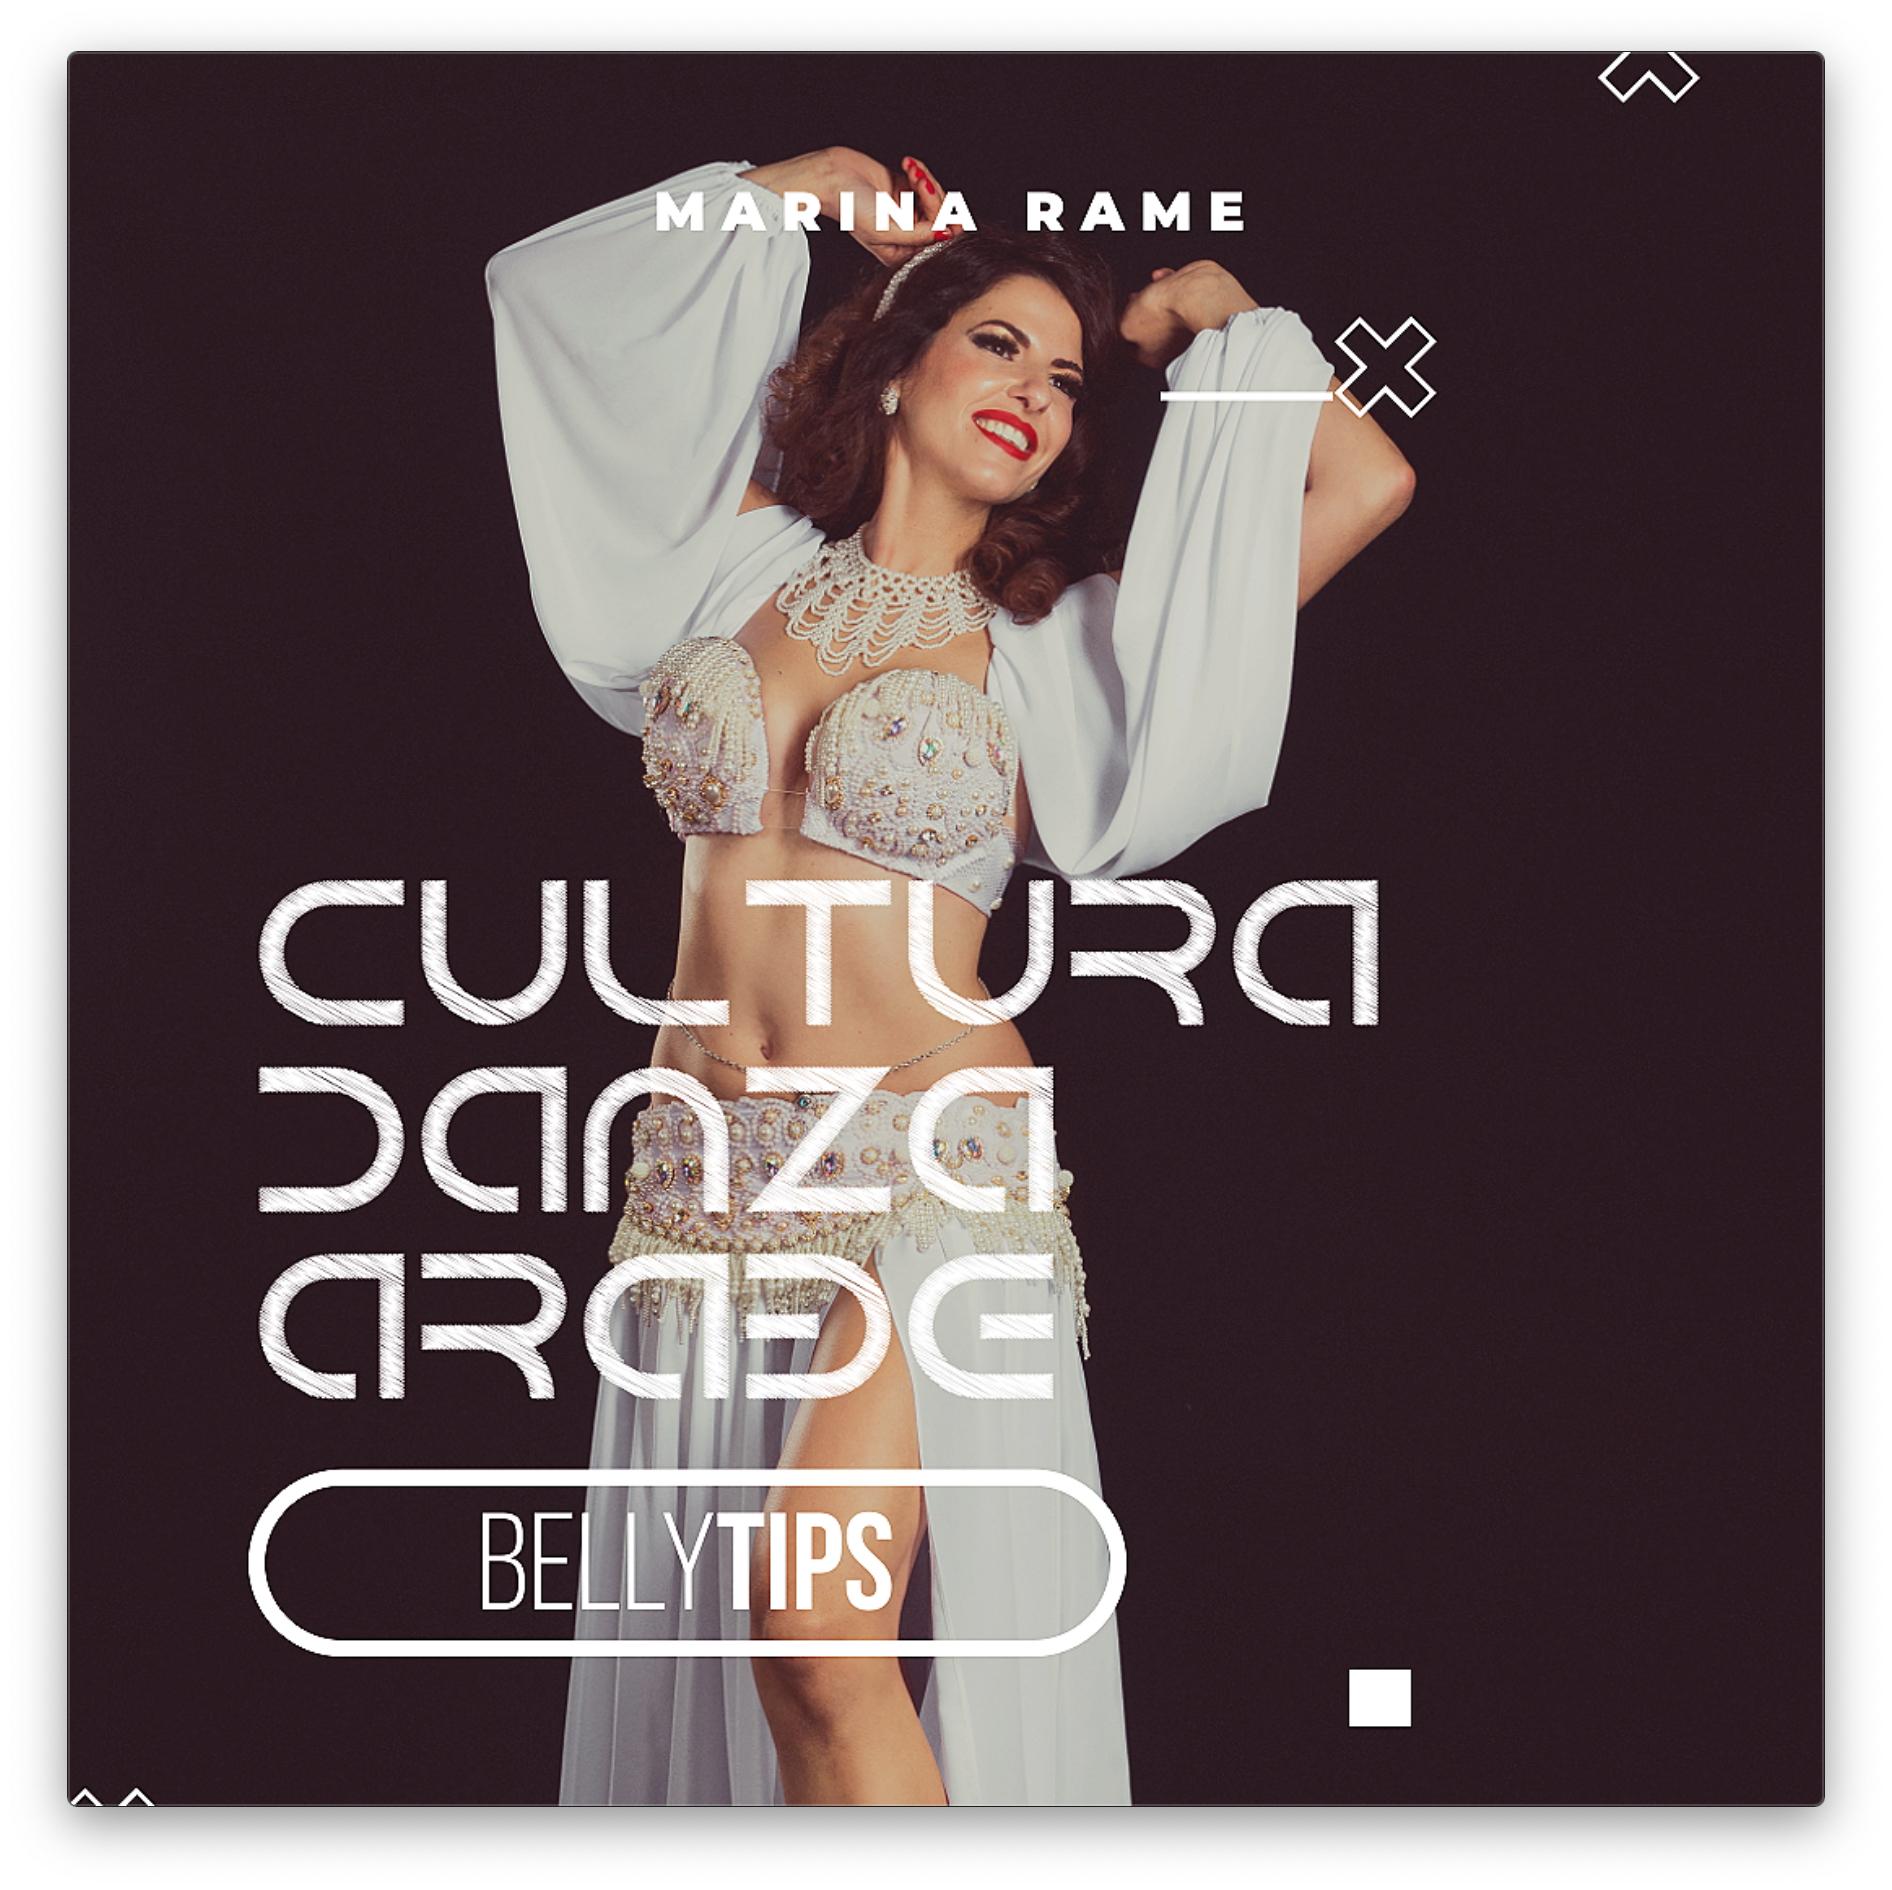 Bellytips #26 - Marina Rame (La época dorada)